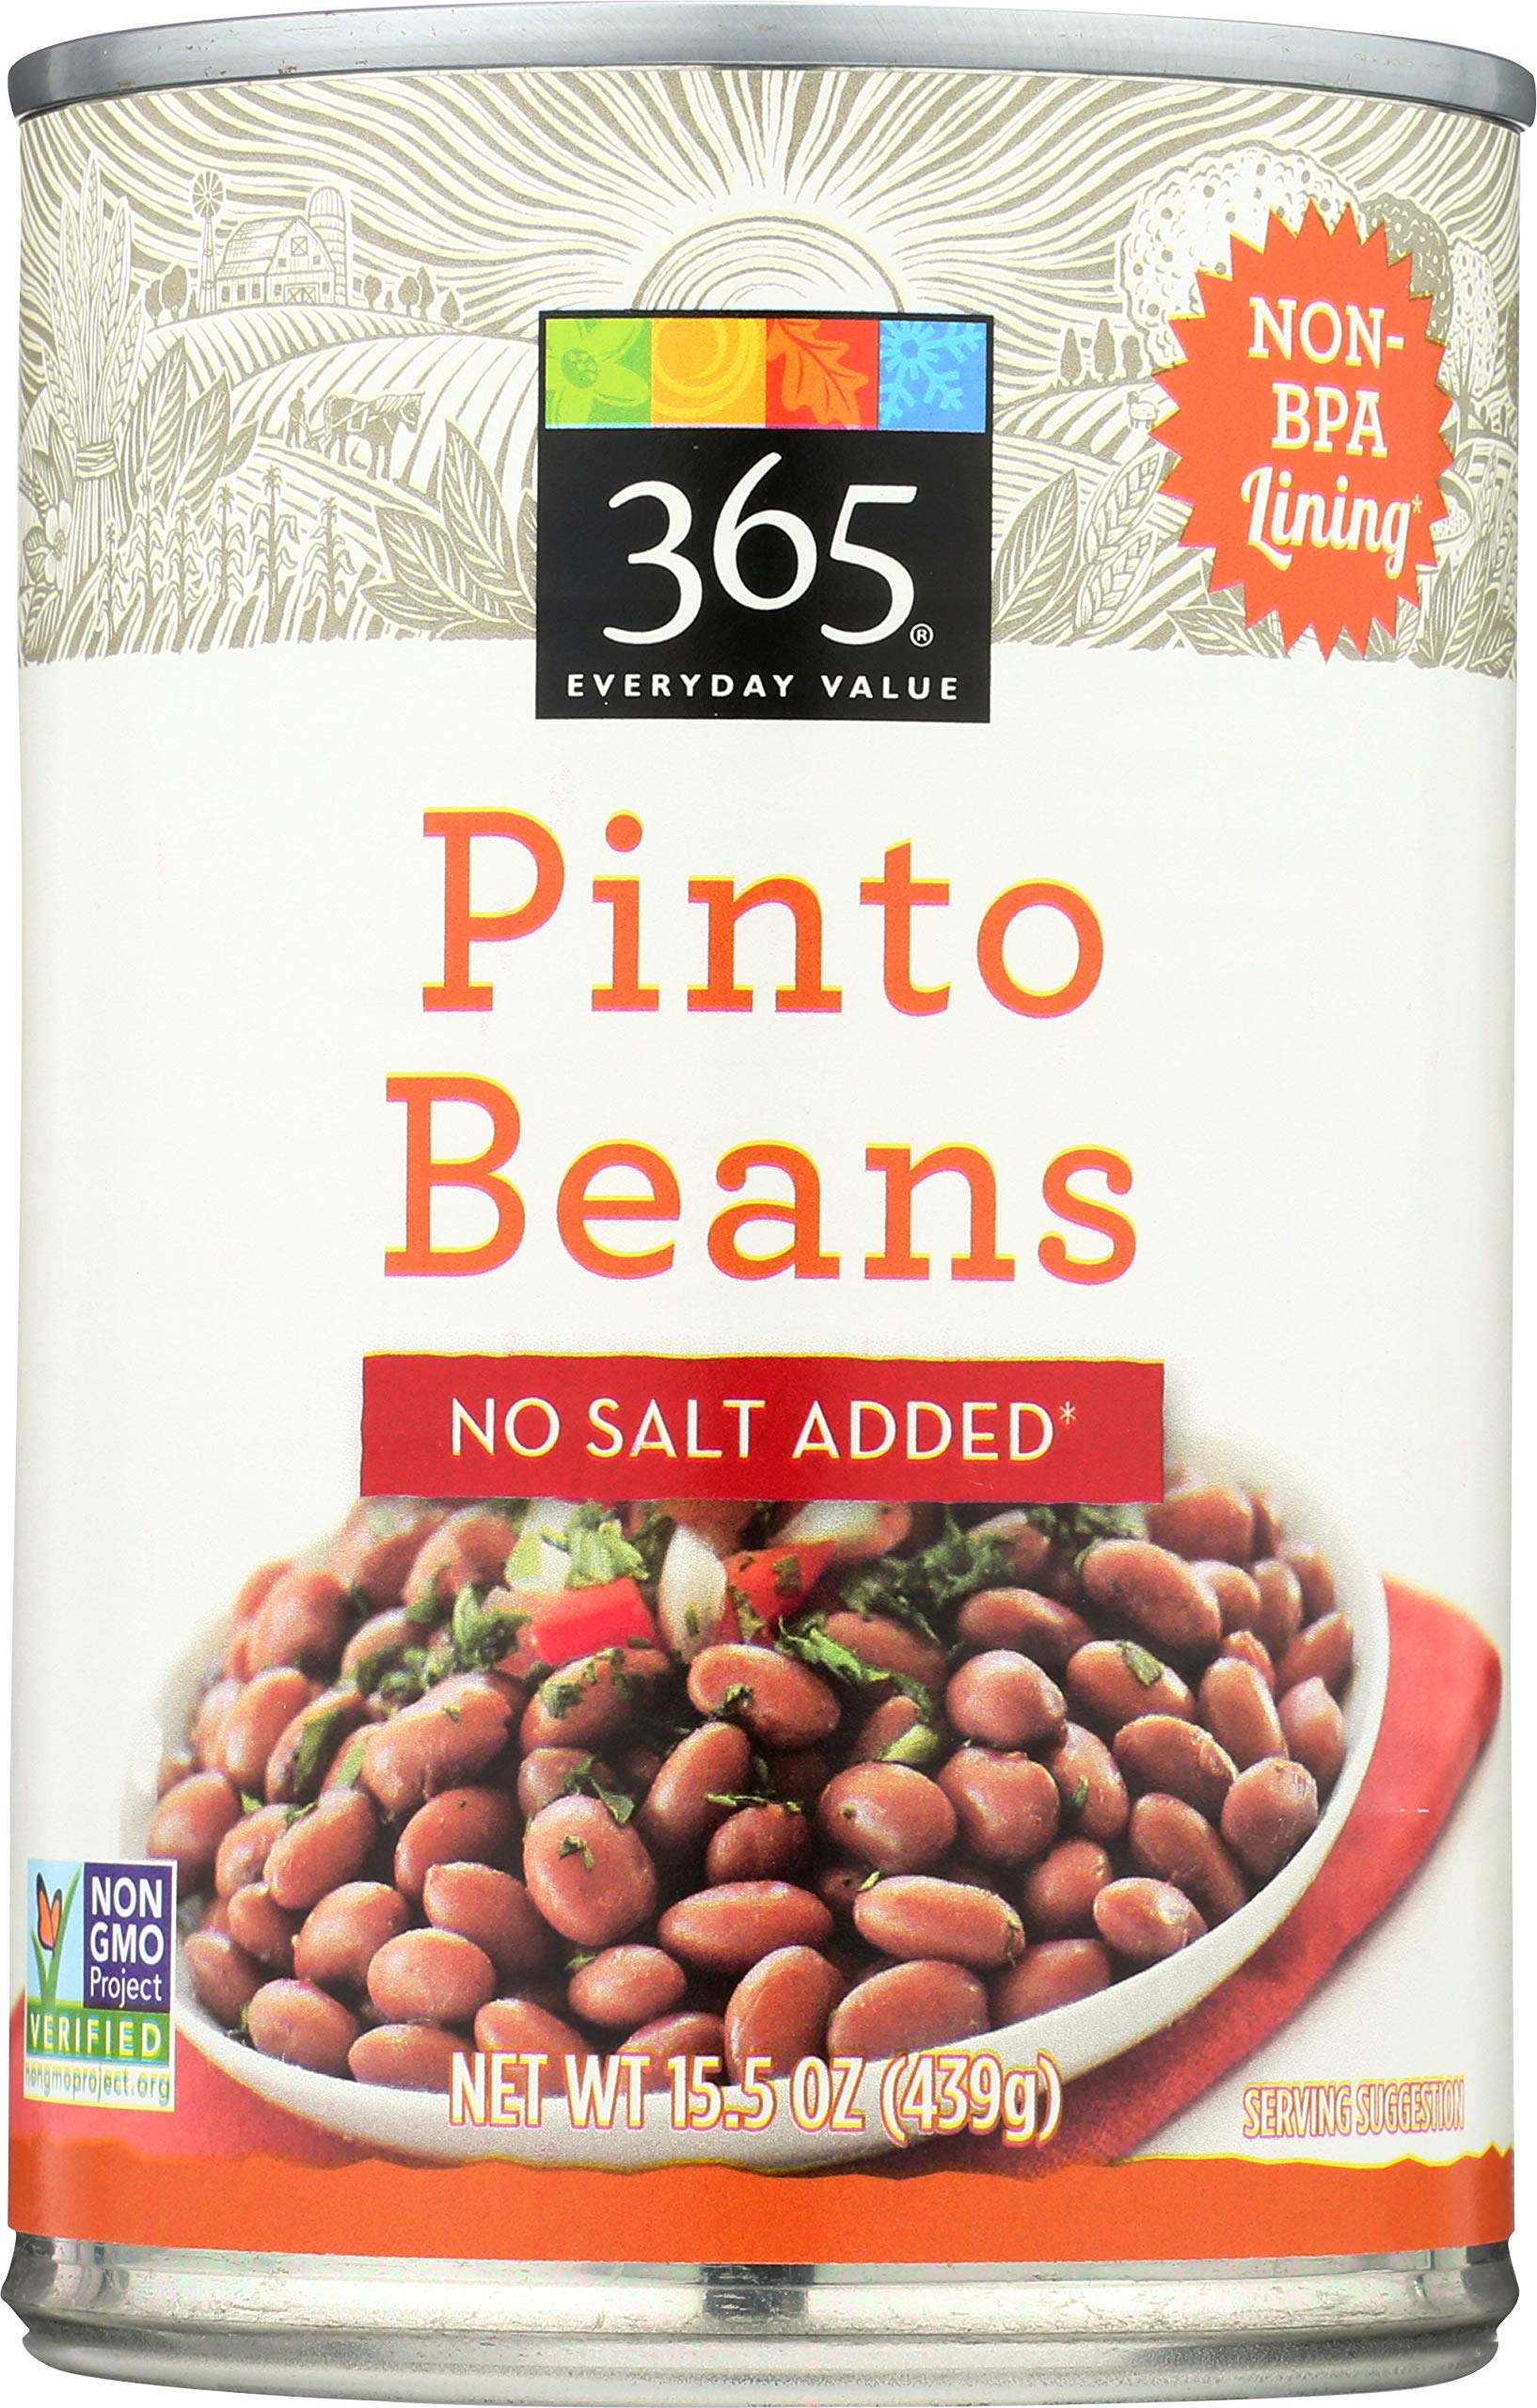 365 Everyday Value, Pinto Beans No Salt Added, 15.5 Ounce